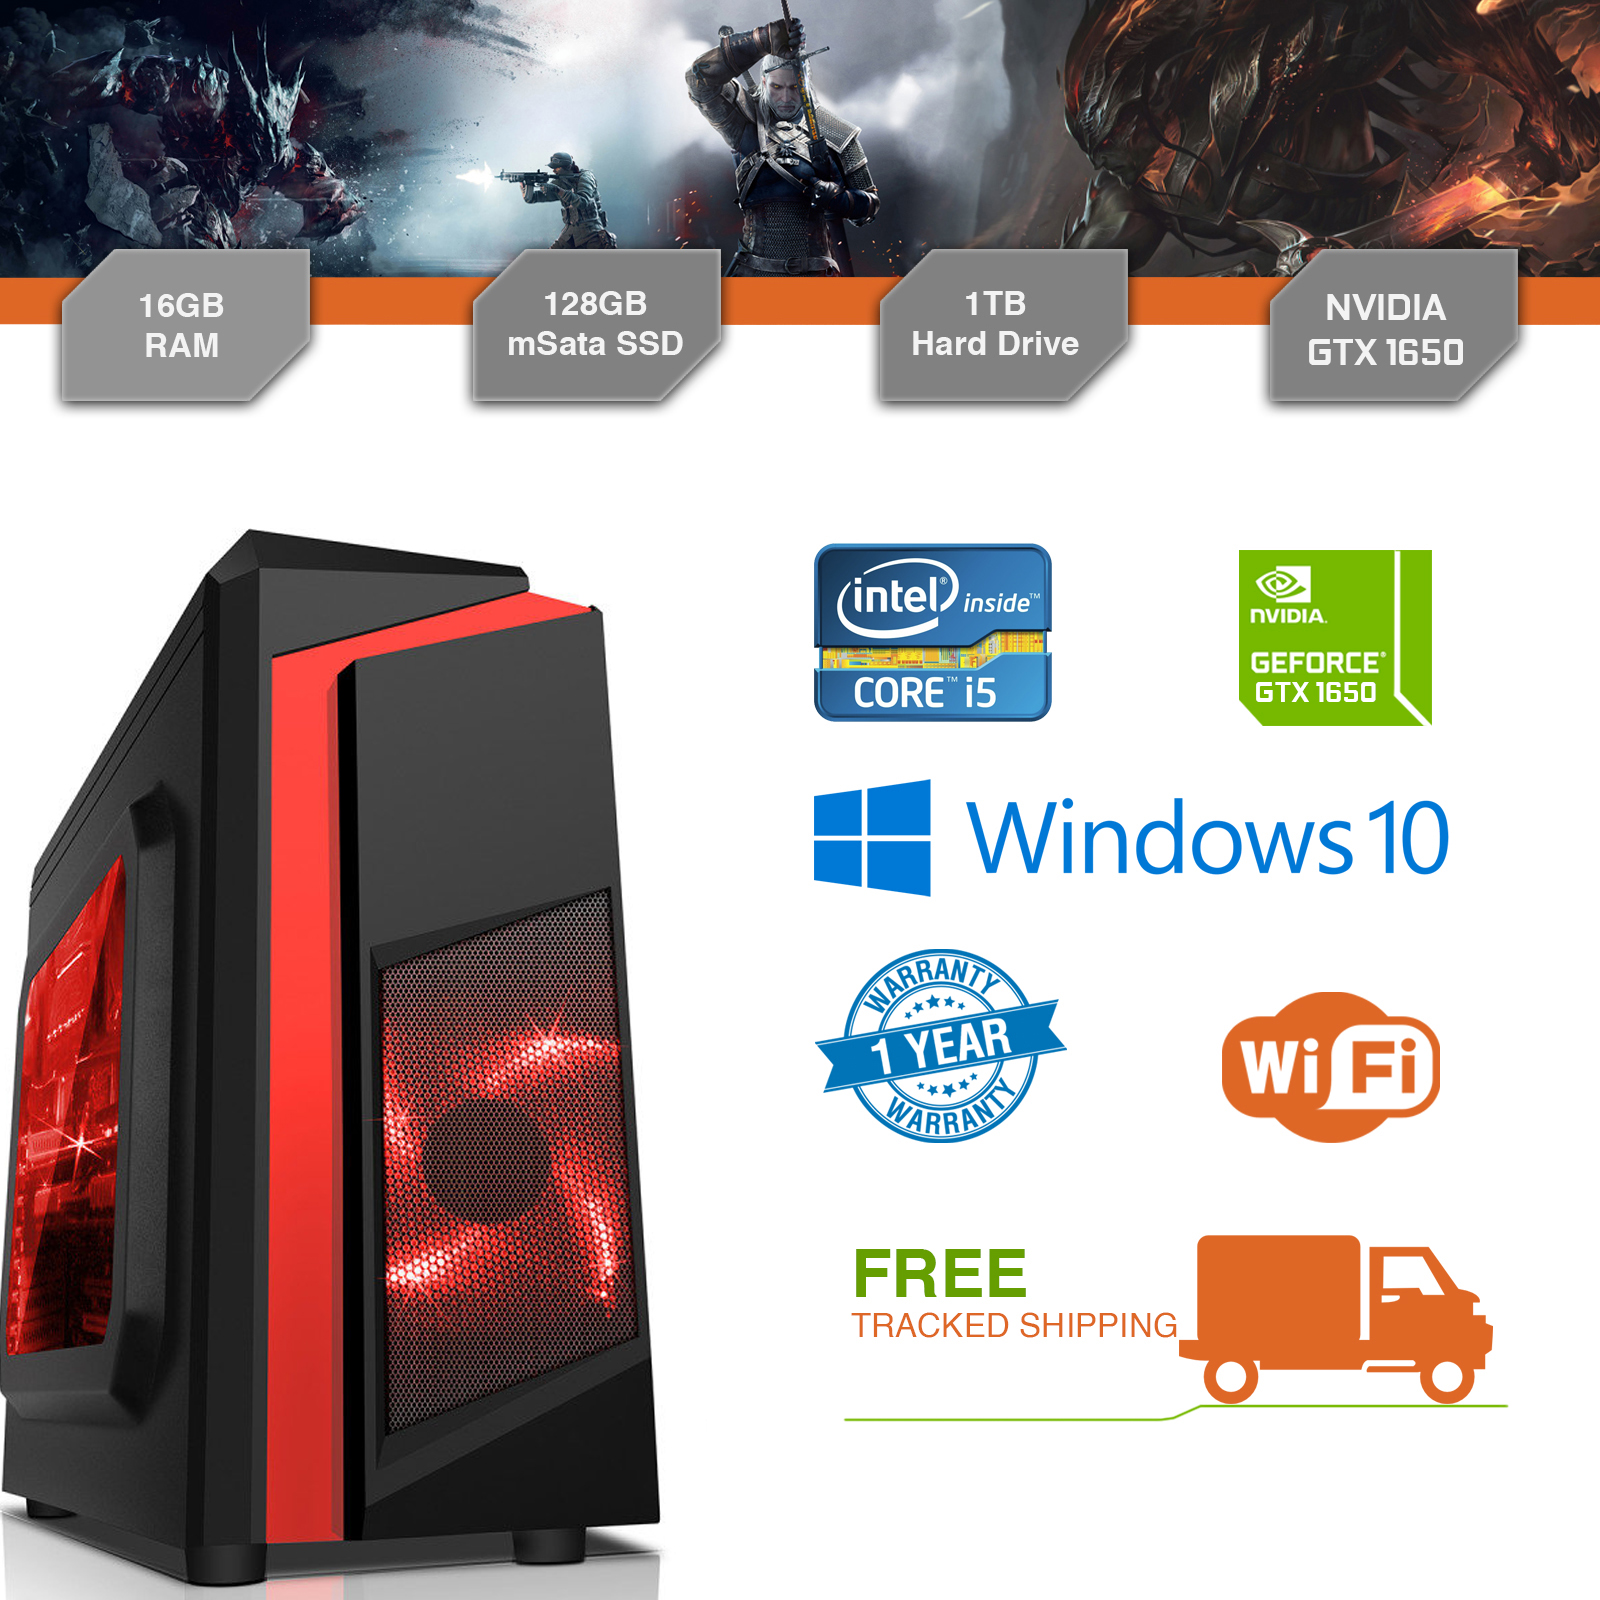 Cheap Gaming PC Intel Core i5 3.1GHz Windows 10 GTX1650 16GB RAM 128GB SSD 1TB